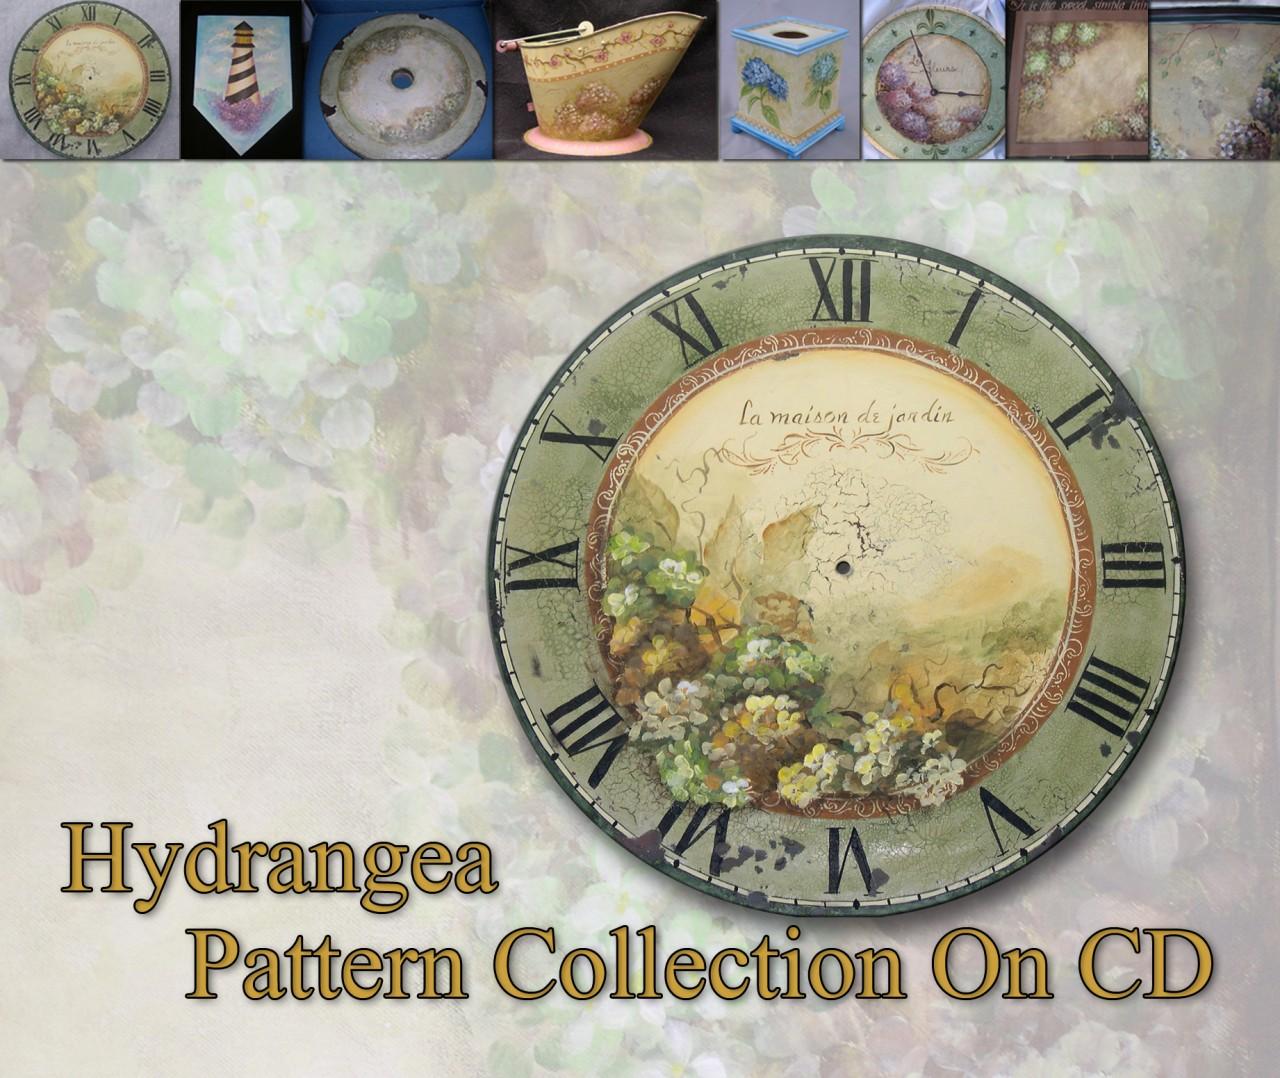 Hydrangea Pattern Collection